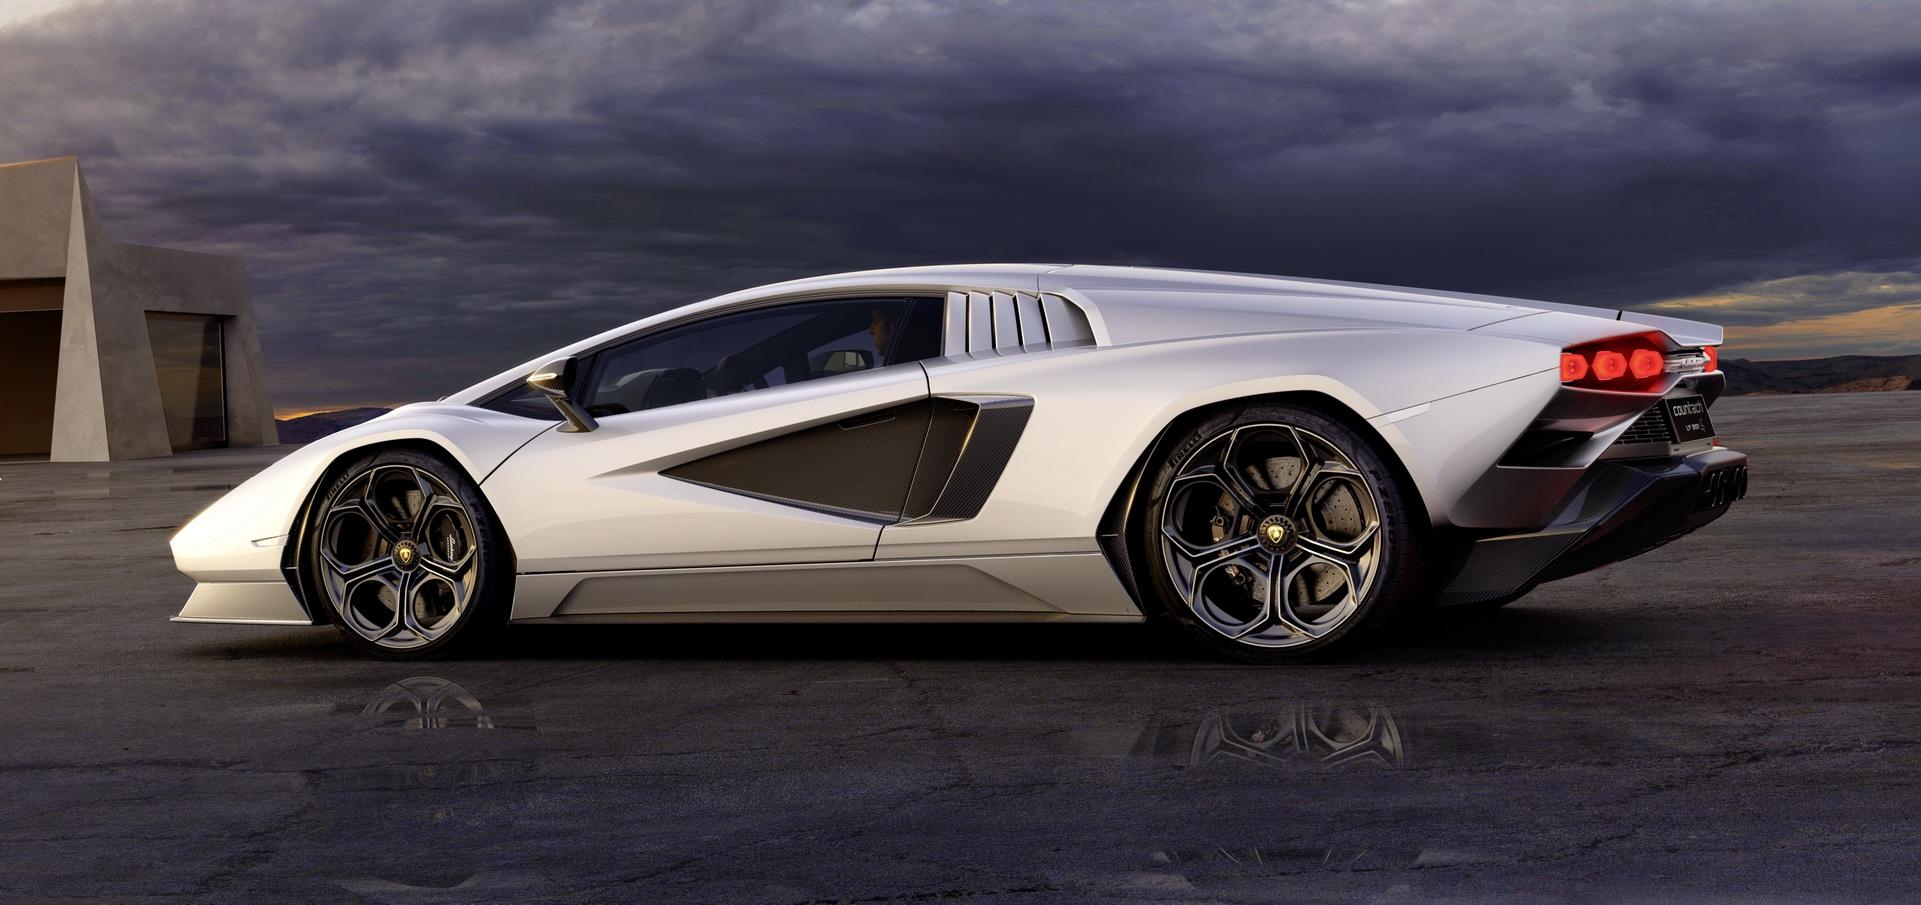 2022 Lamborghini Countach LPI 800-4 Side Wallpapers (6)